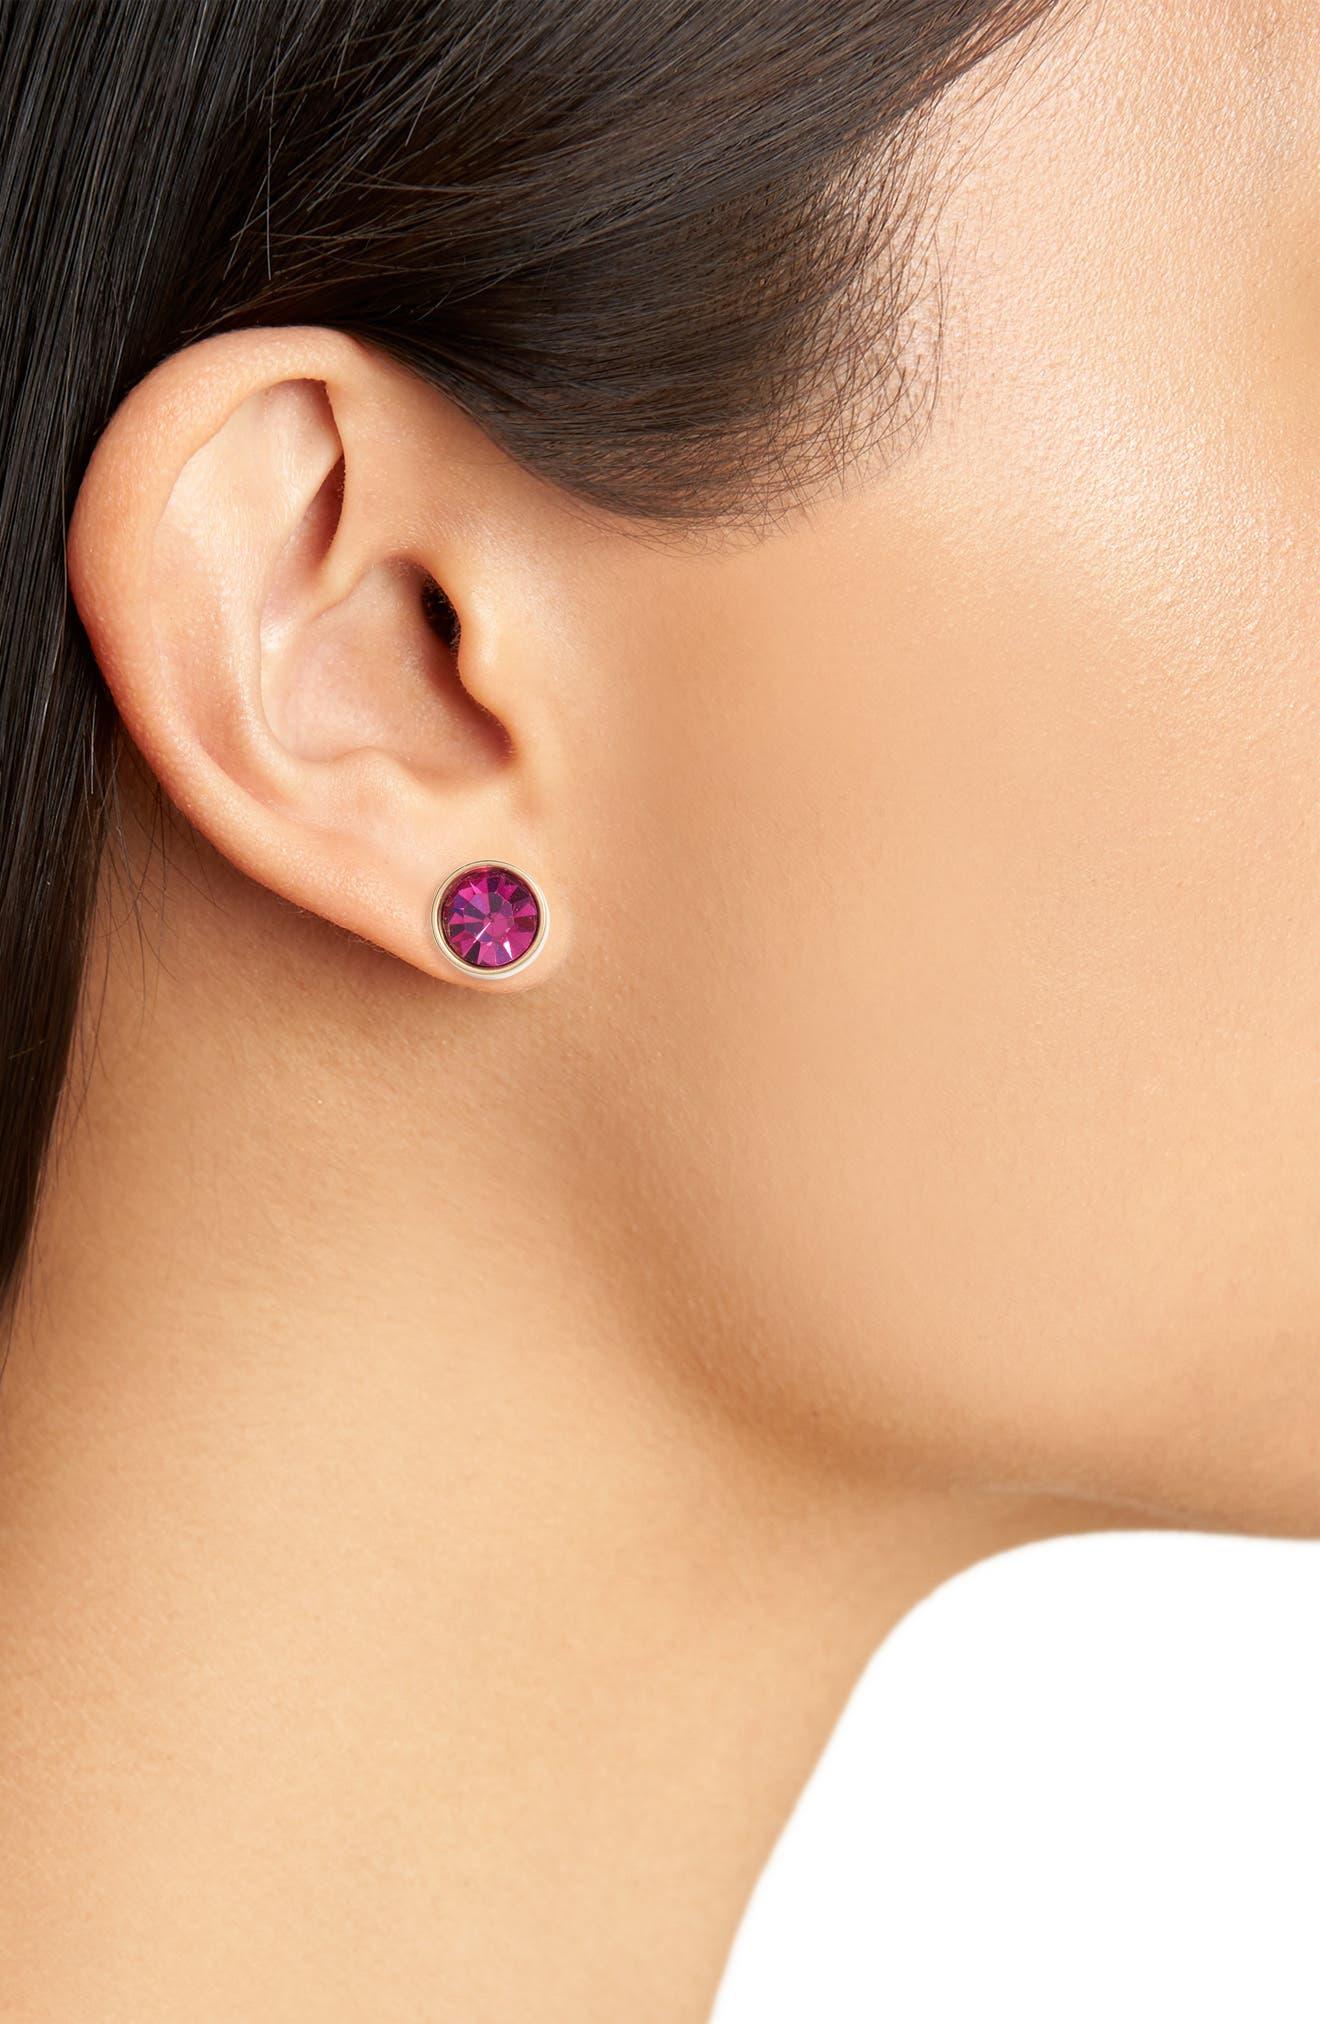 Bezel Set Stud Earrings,                             Alternate thumbnail 2, color,                             Fuchsia/ Gold